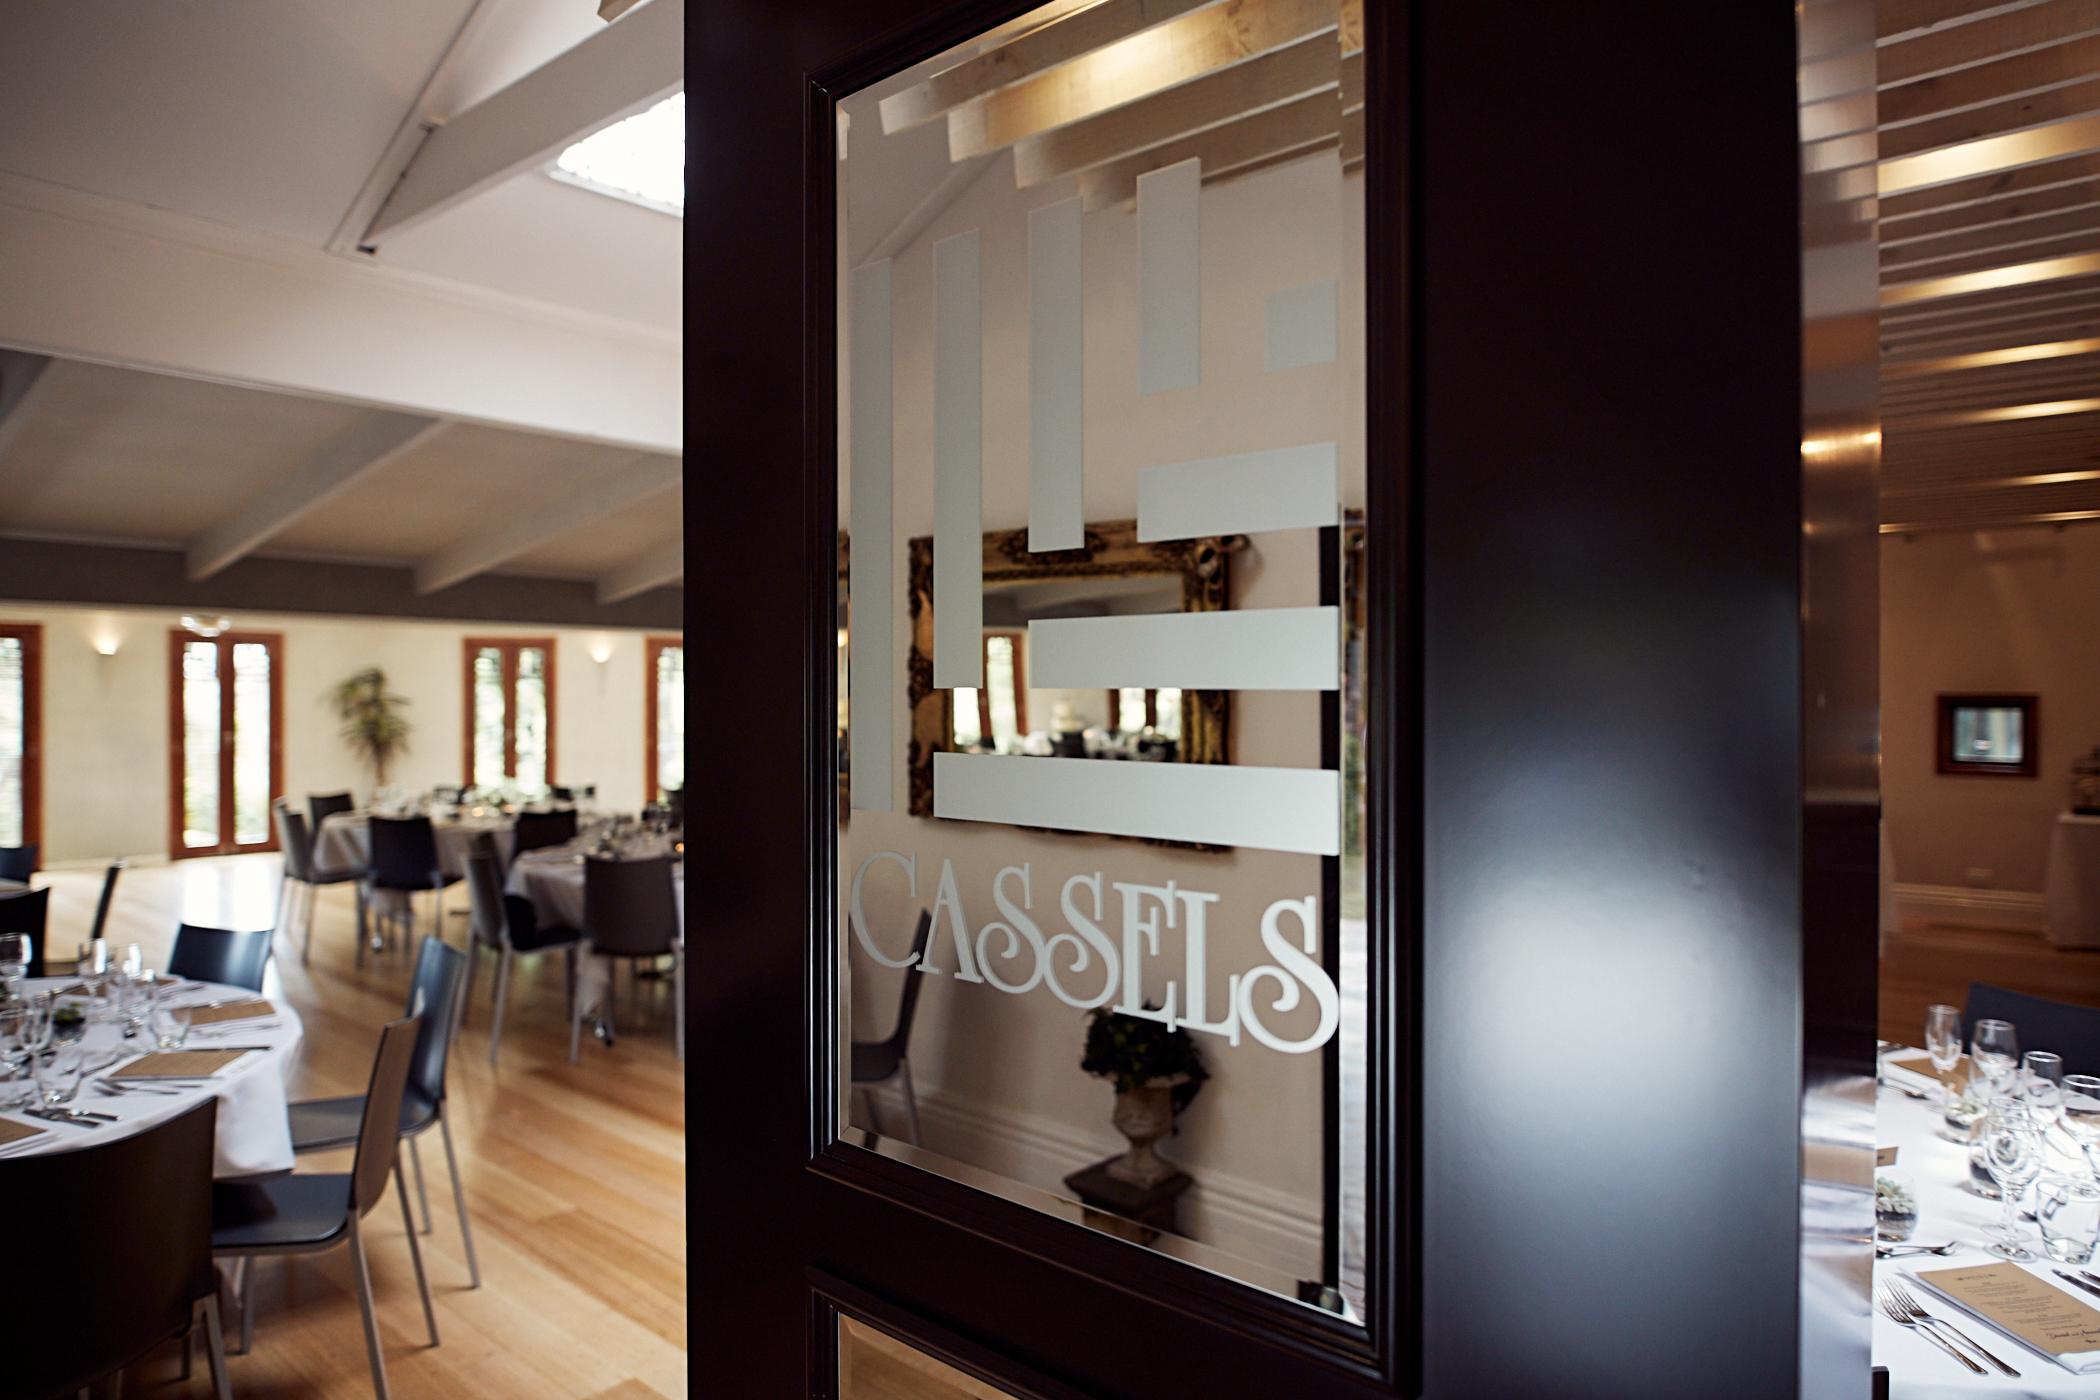 Cassels interior photo